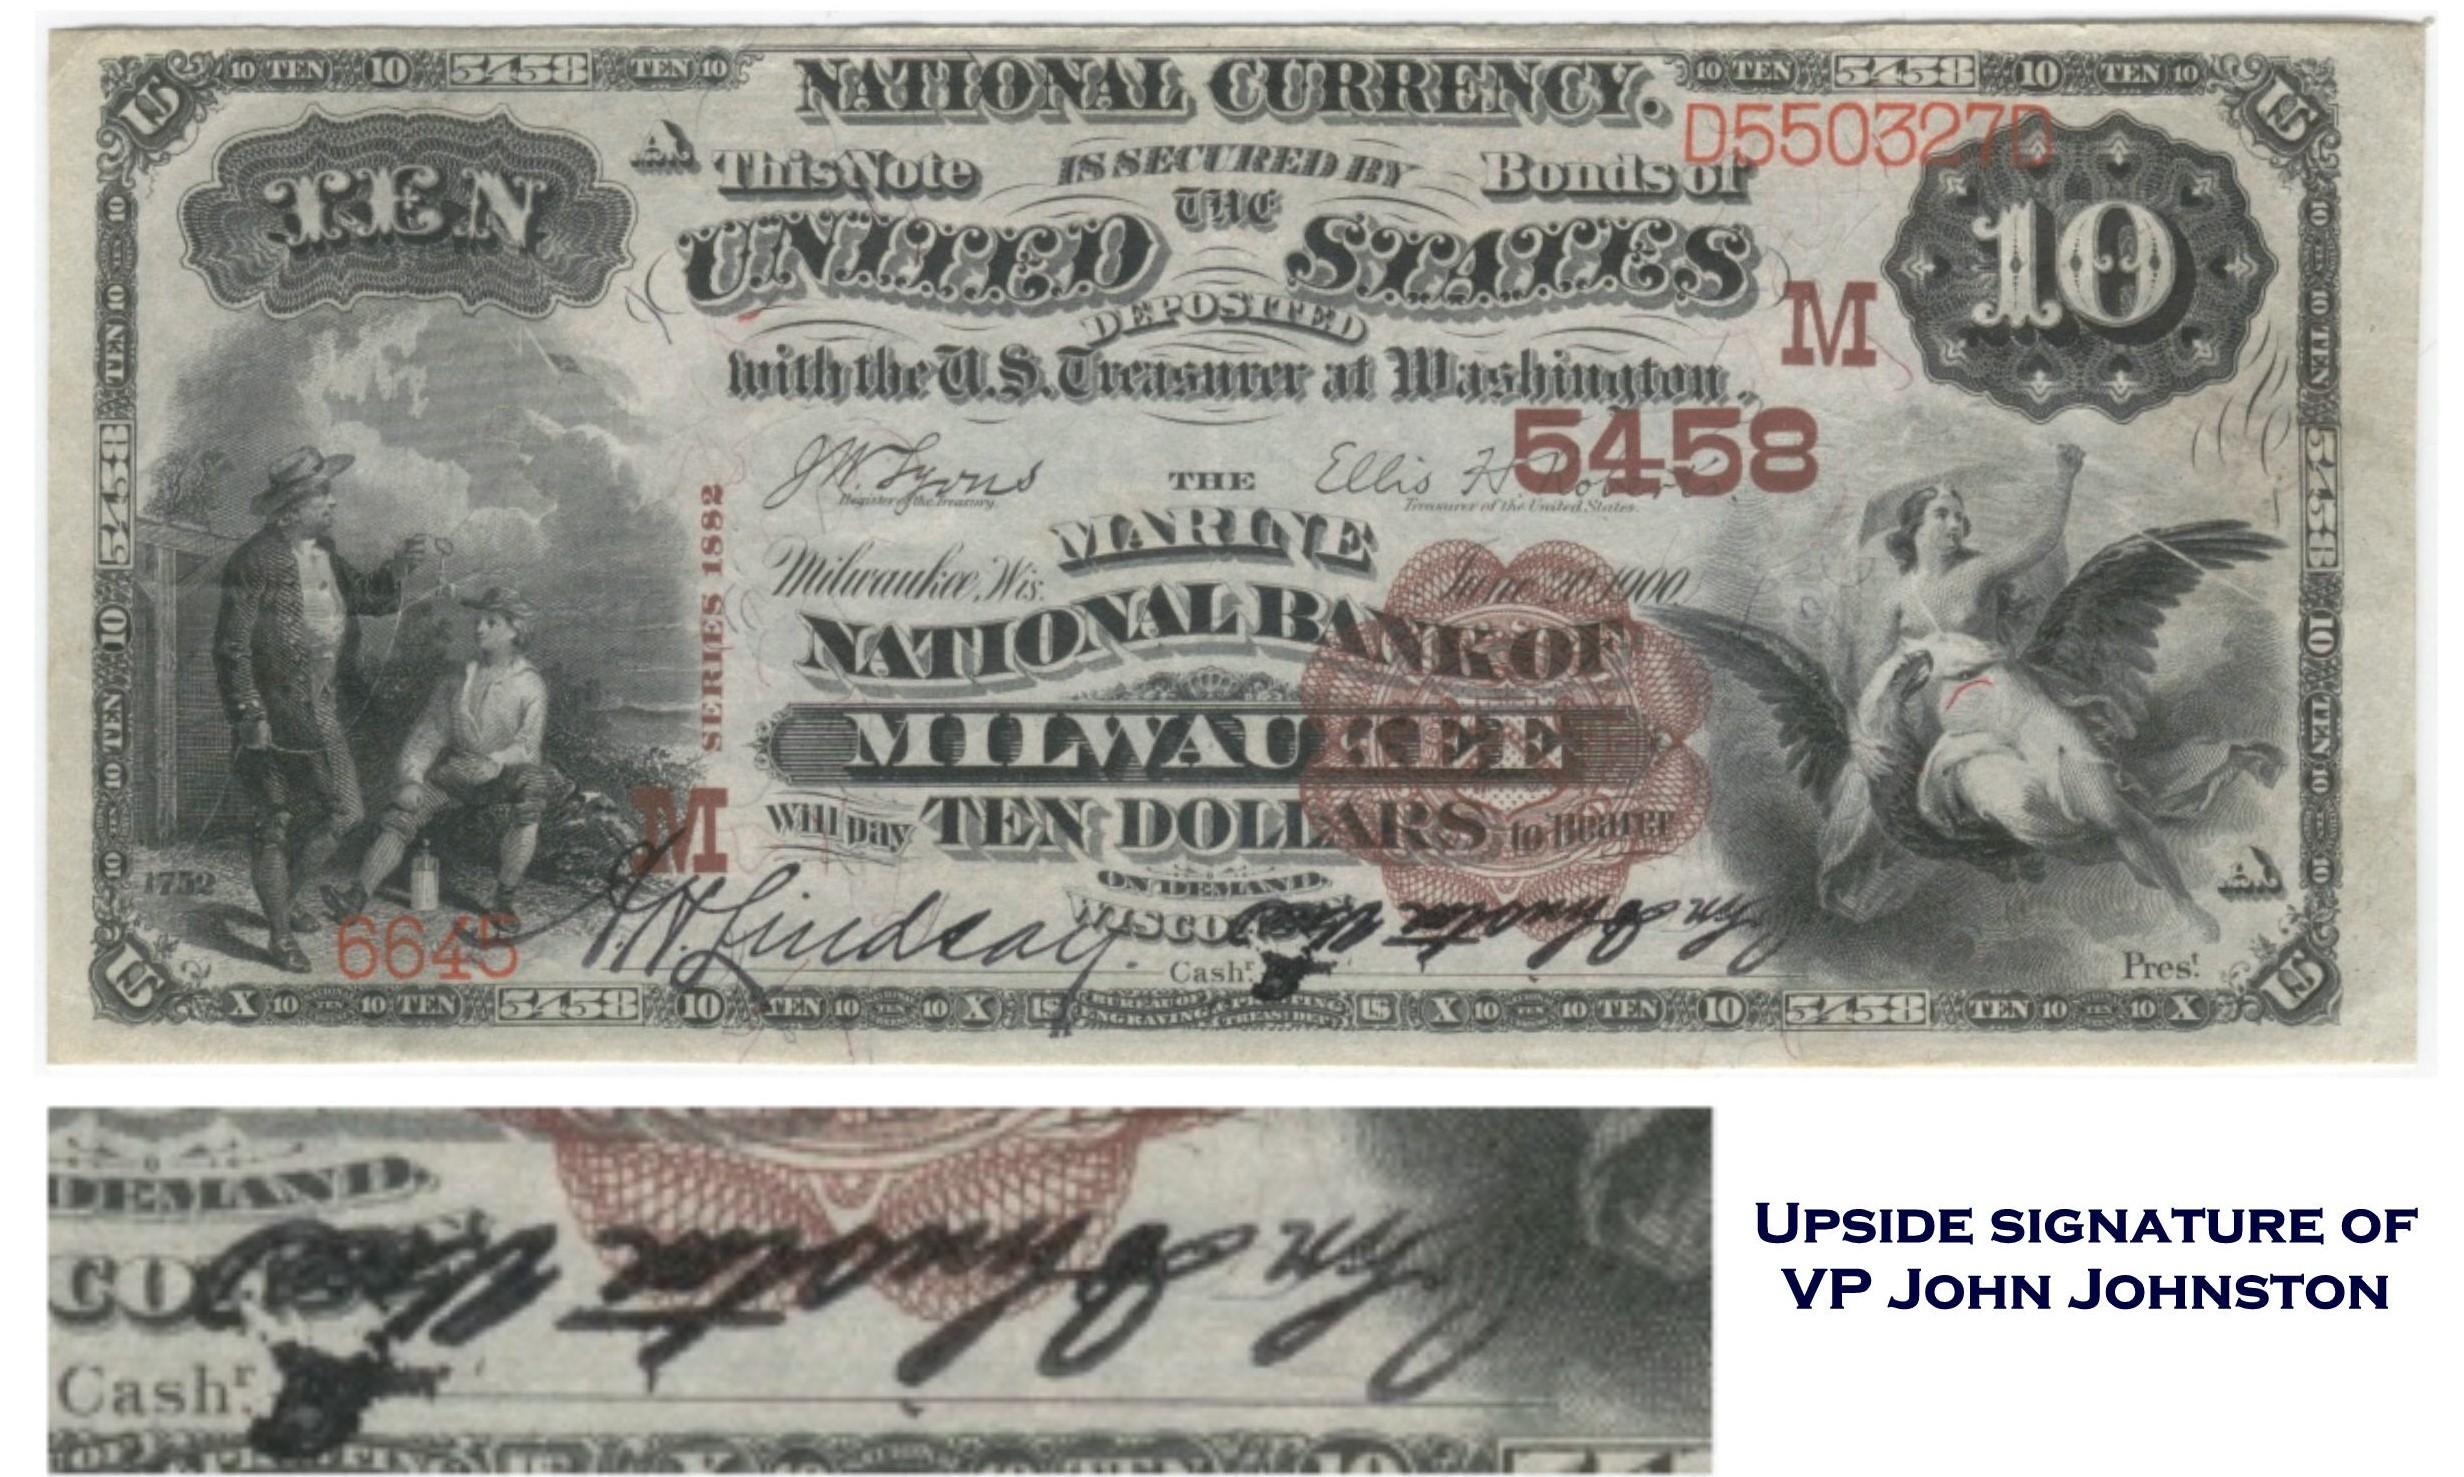 Milwaukee, 82BB, (ch.5458, Marine NB), $10, ERROR, invert sig.jpg